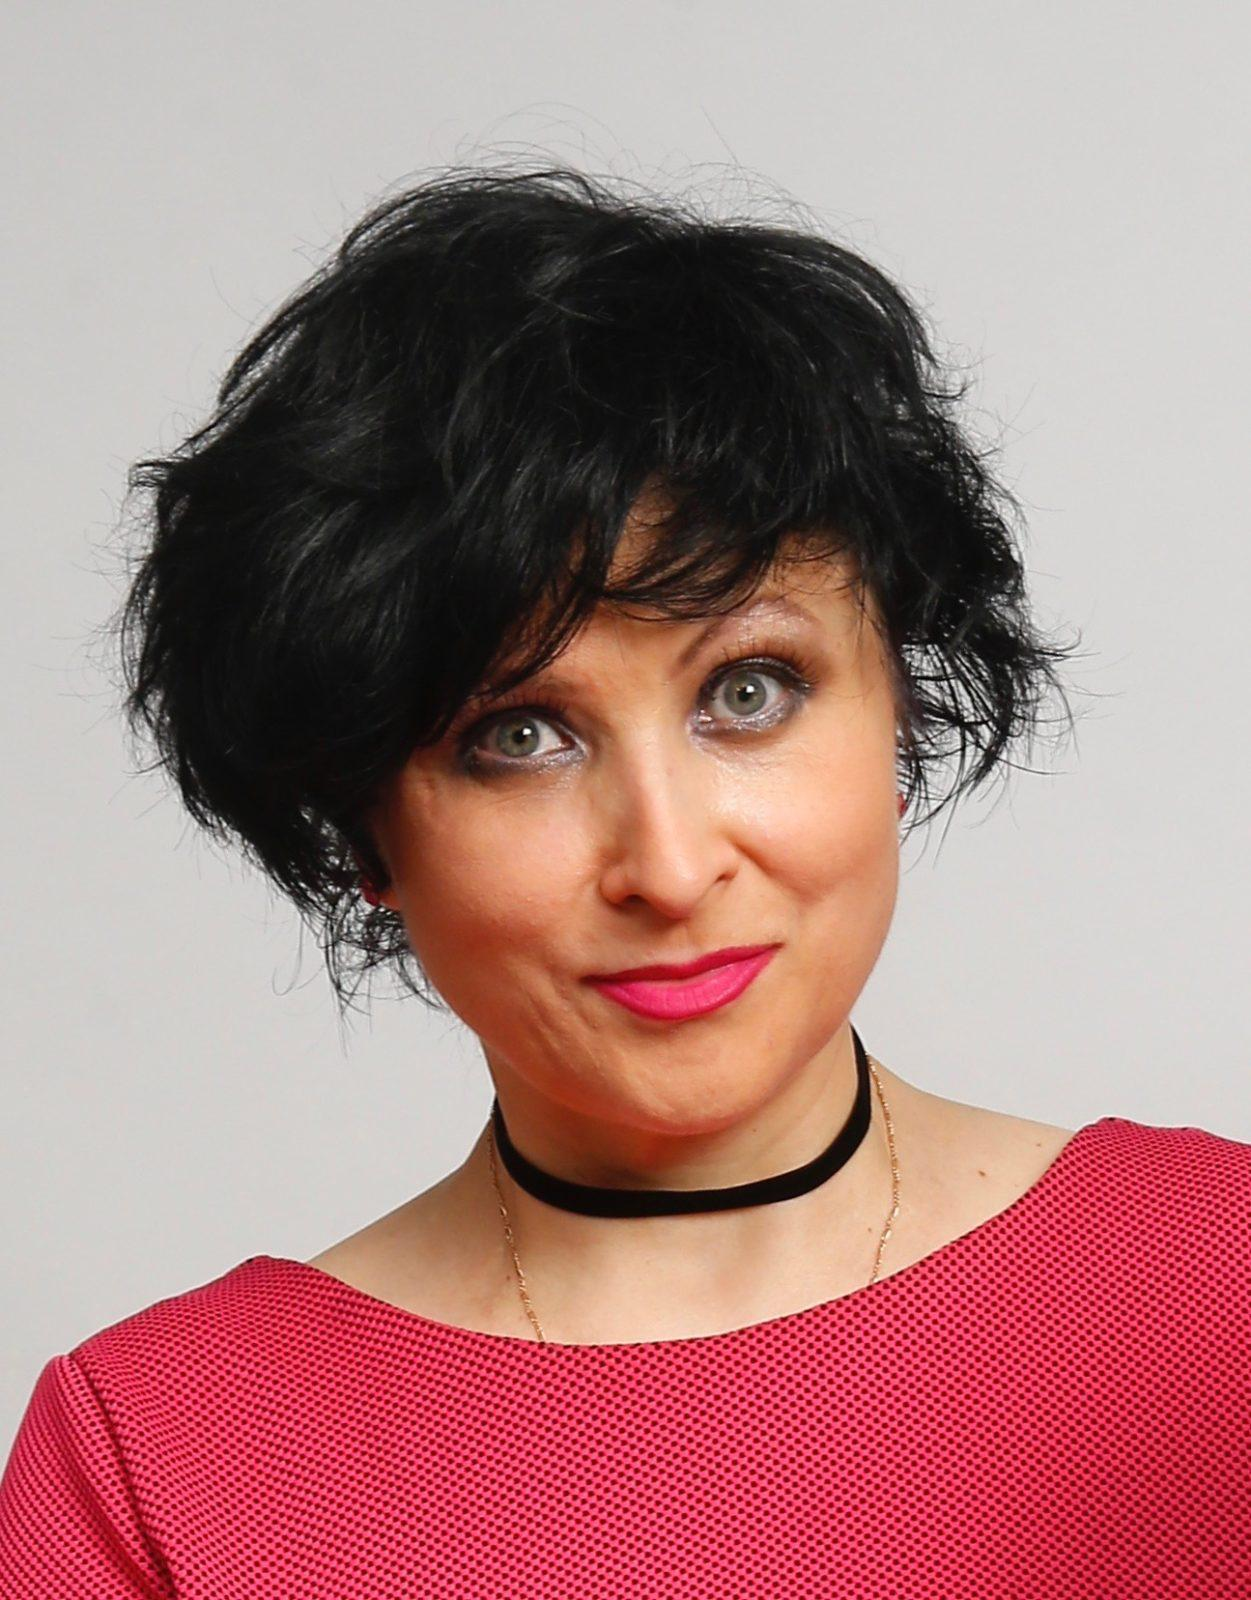 Презентация певицы Алены Даль в ресторане Гладиатор